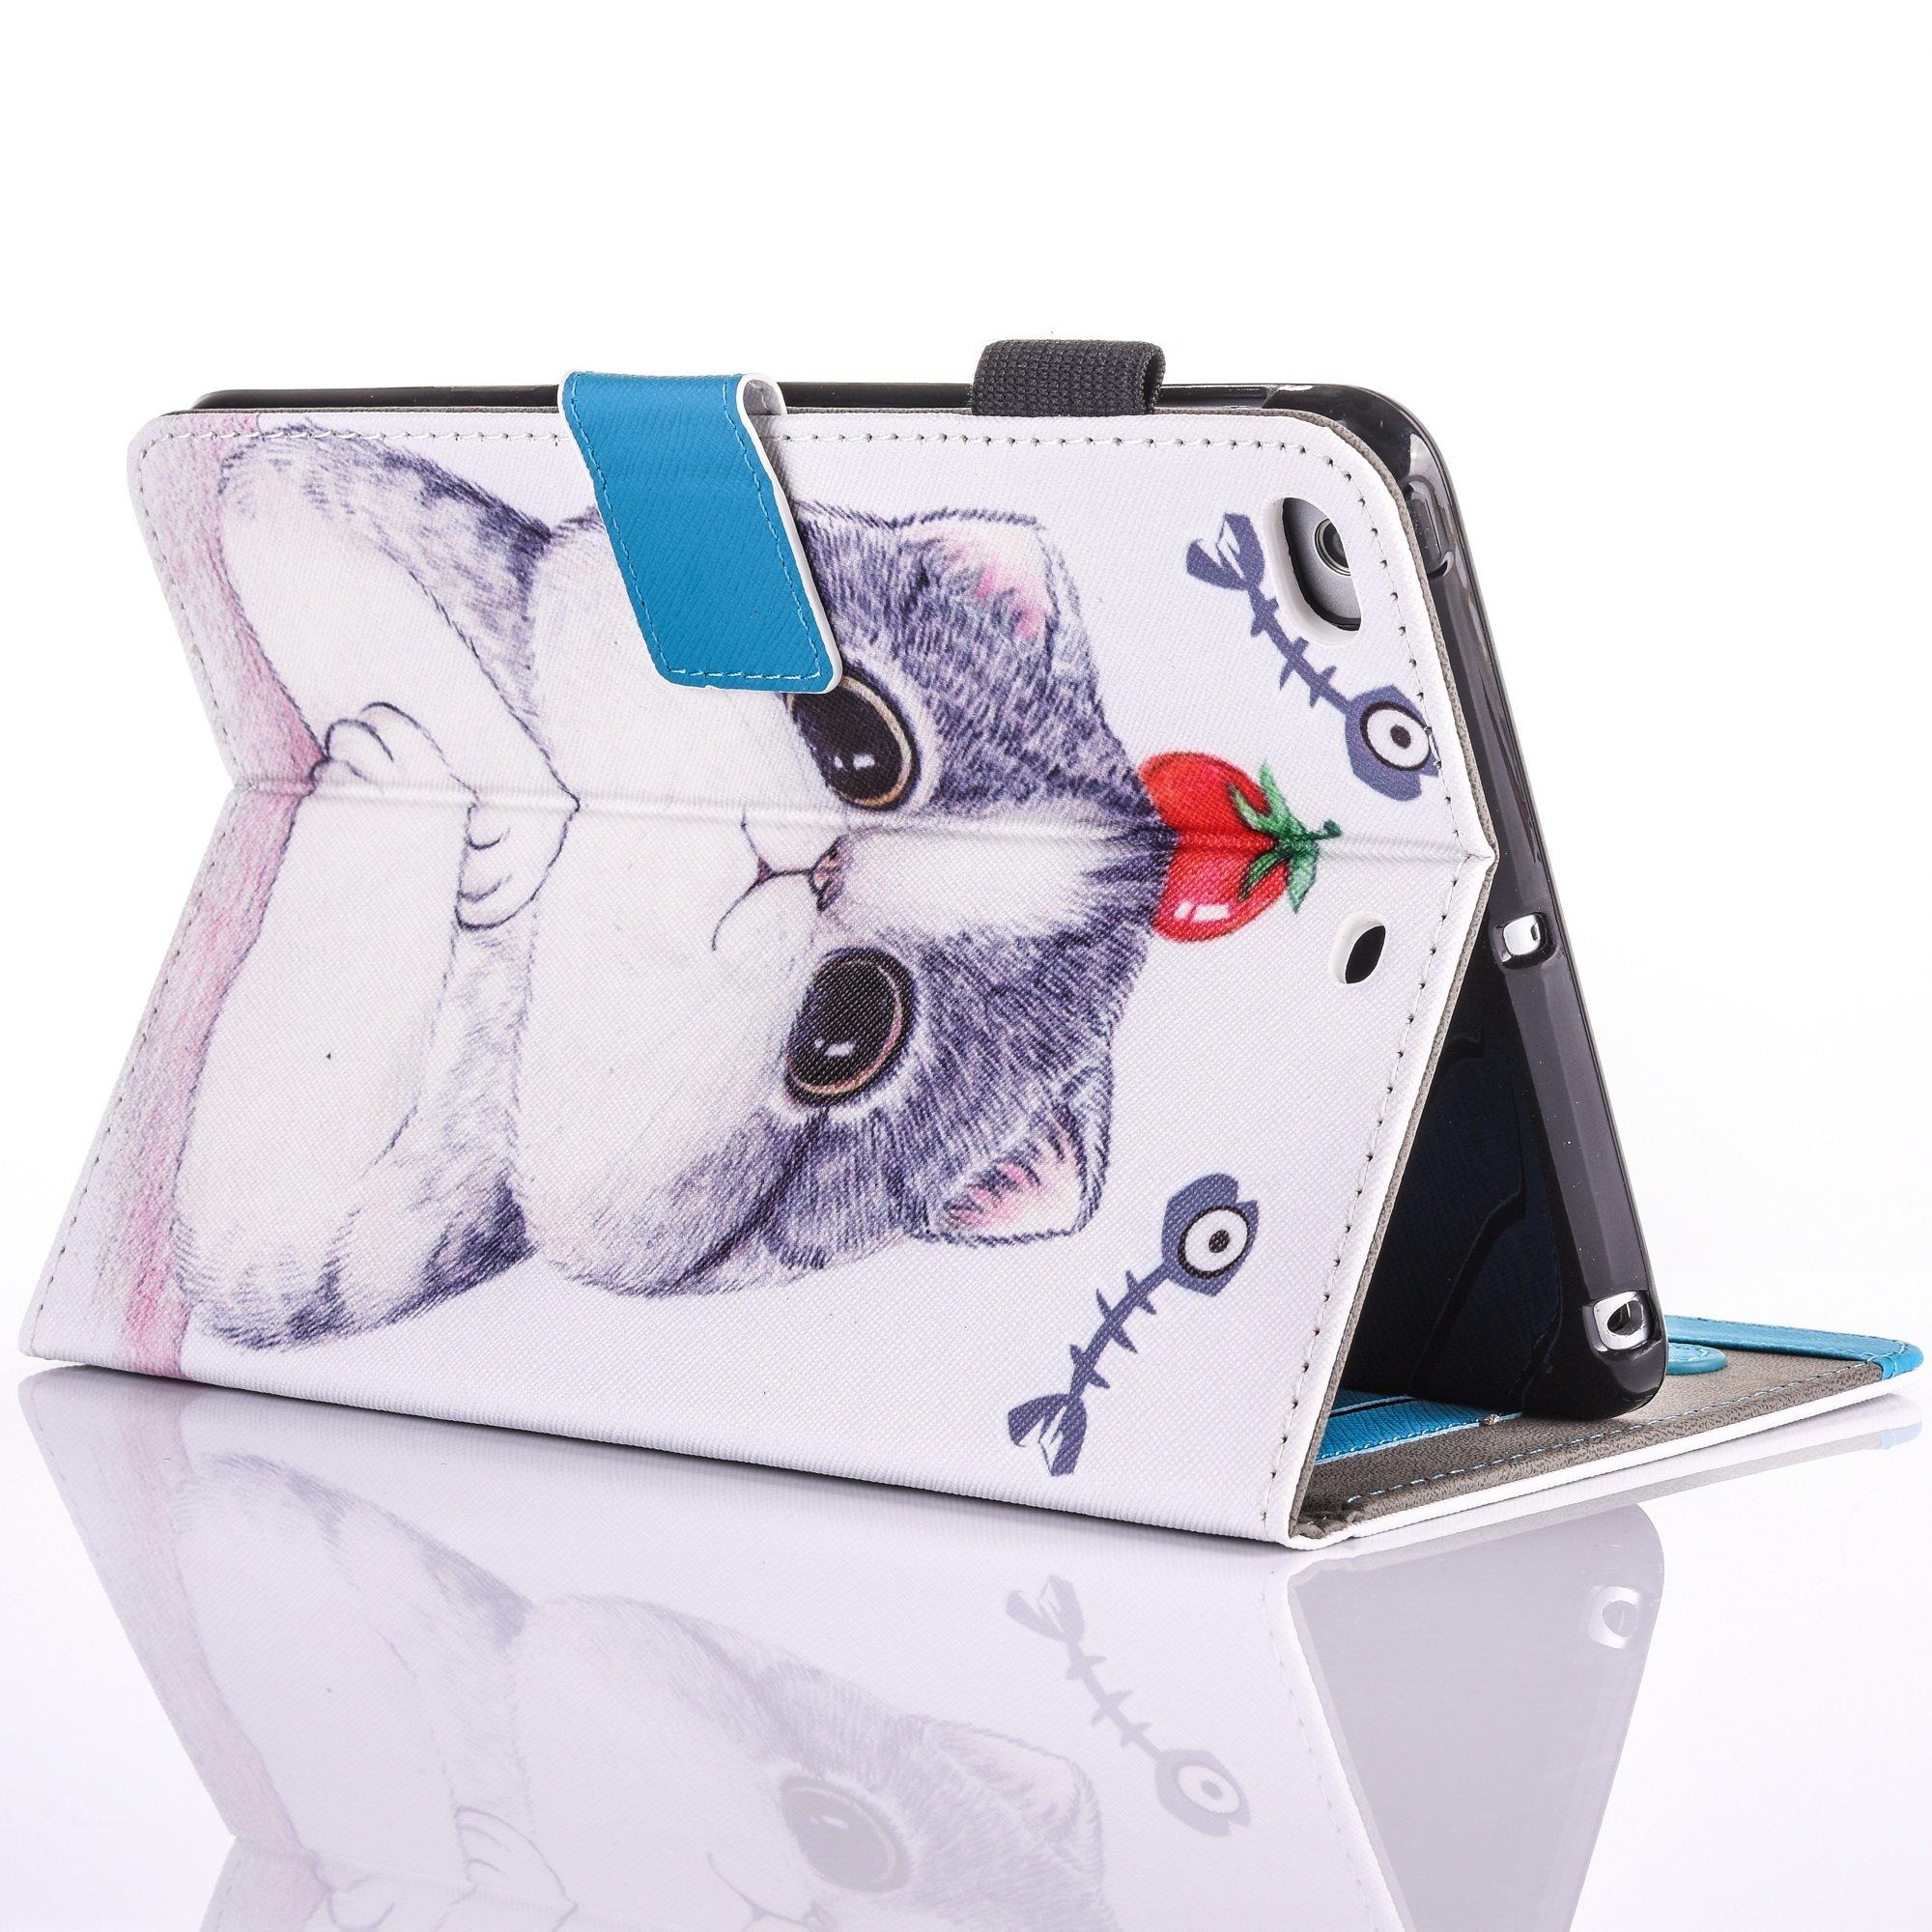 iPad Air 2/iPad Air/iPad 9.7 inch 2017 Case, PU Leather Folio [Anti-Slip] Cover with [Magnetic Closure] [Cards Slots] Auto Sleep/Wake for Apple iPad 9.7 2017/iPad Air 1&2 (iPad 5&6), Sketch Cat by Wallace Elec (Image #7)